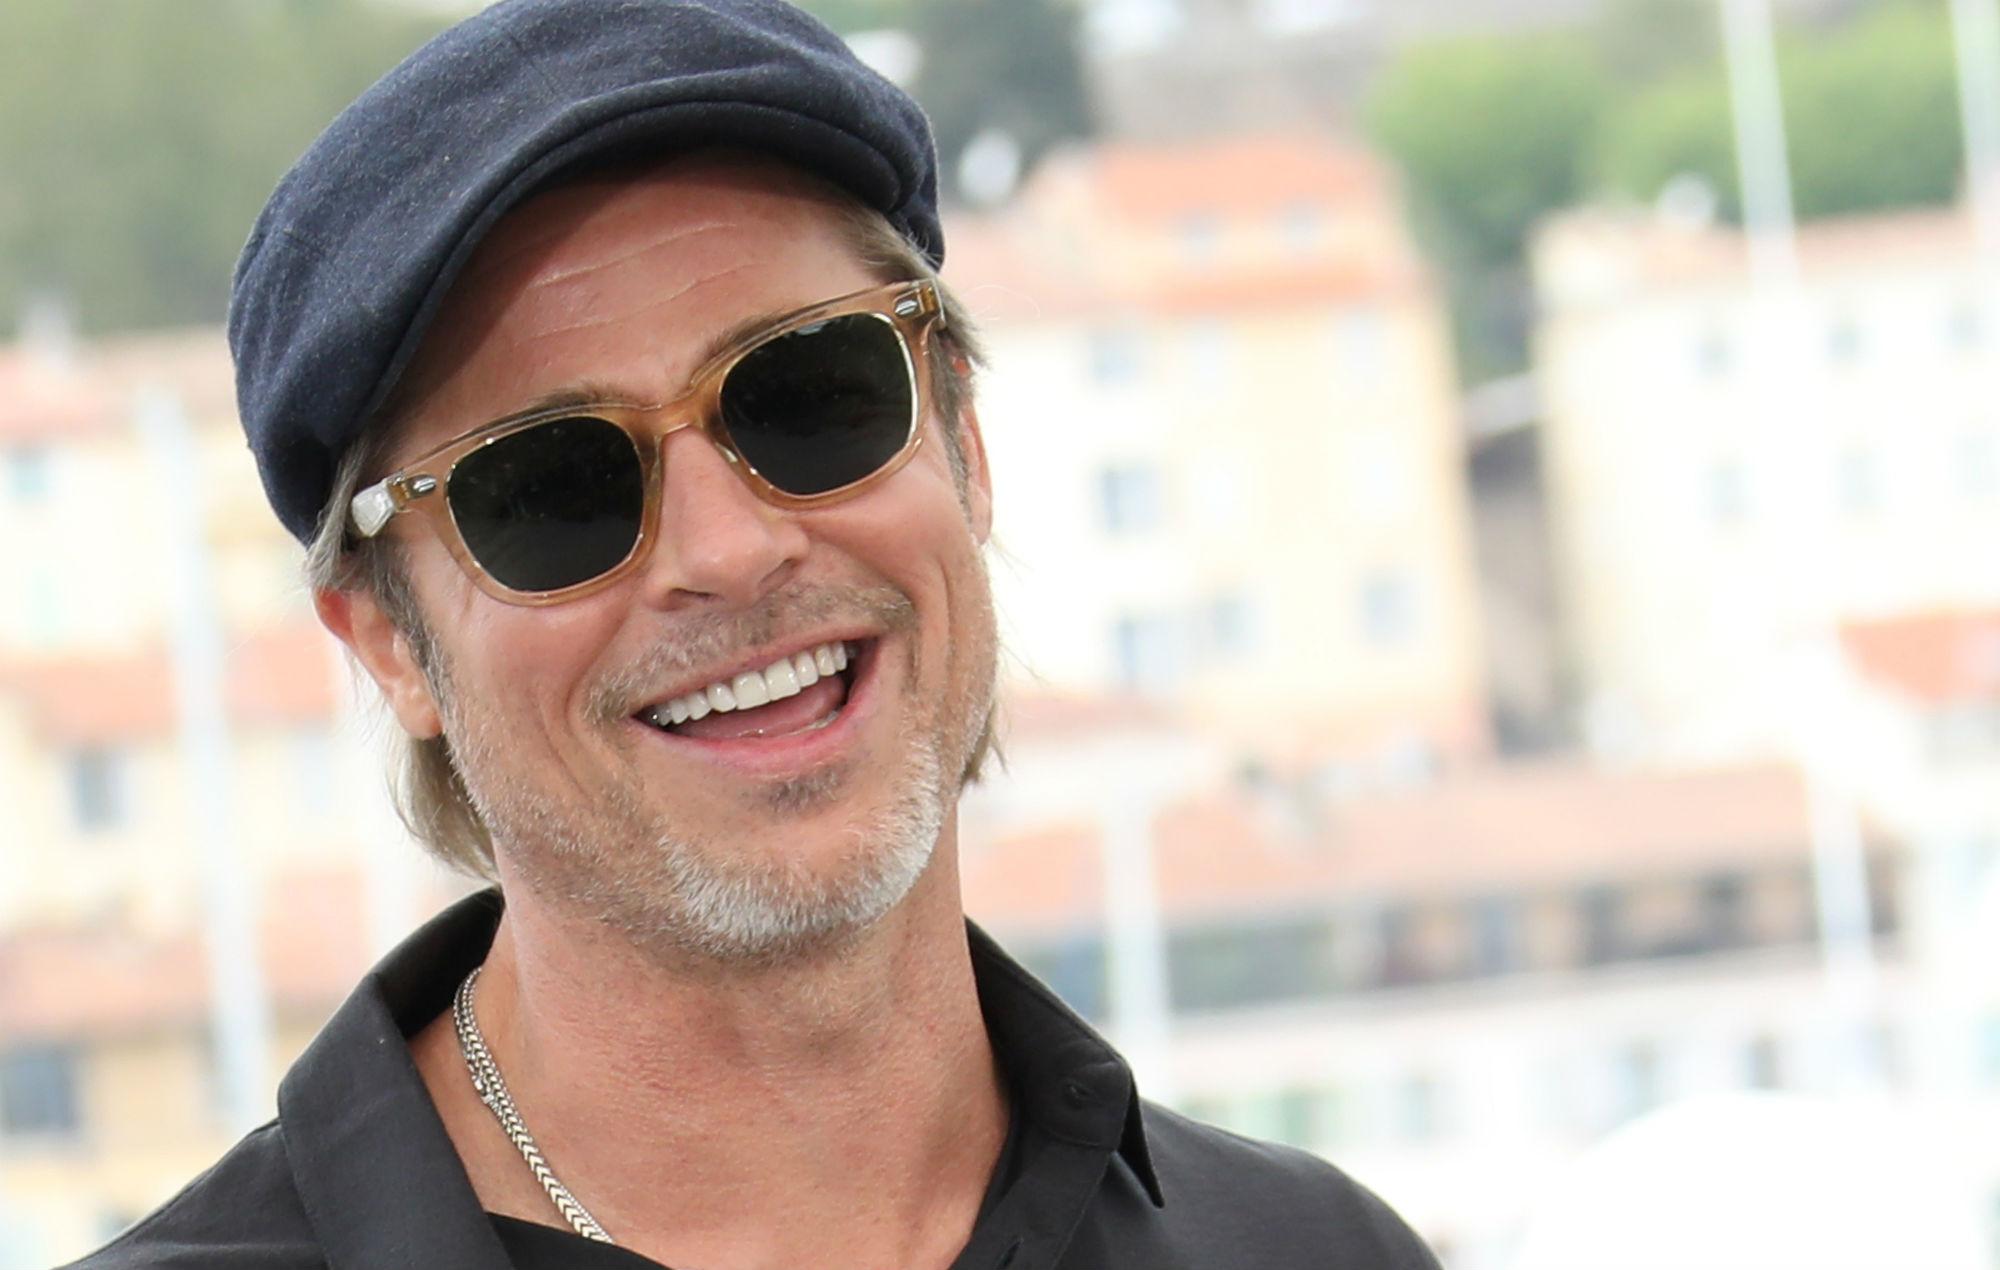 Brad Pitt threatens to sue Straight Pride over 'mascot ...